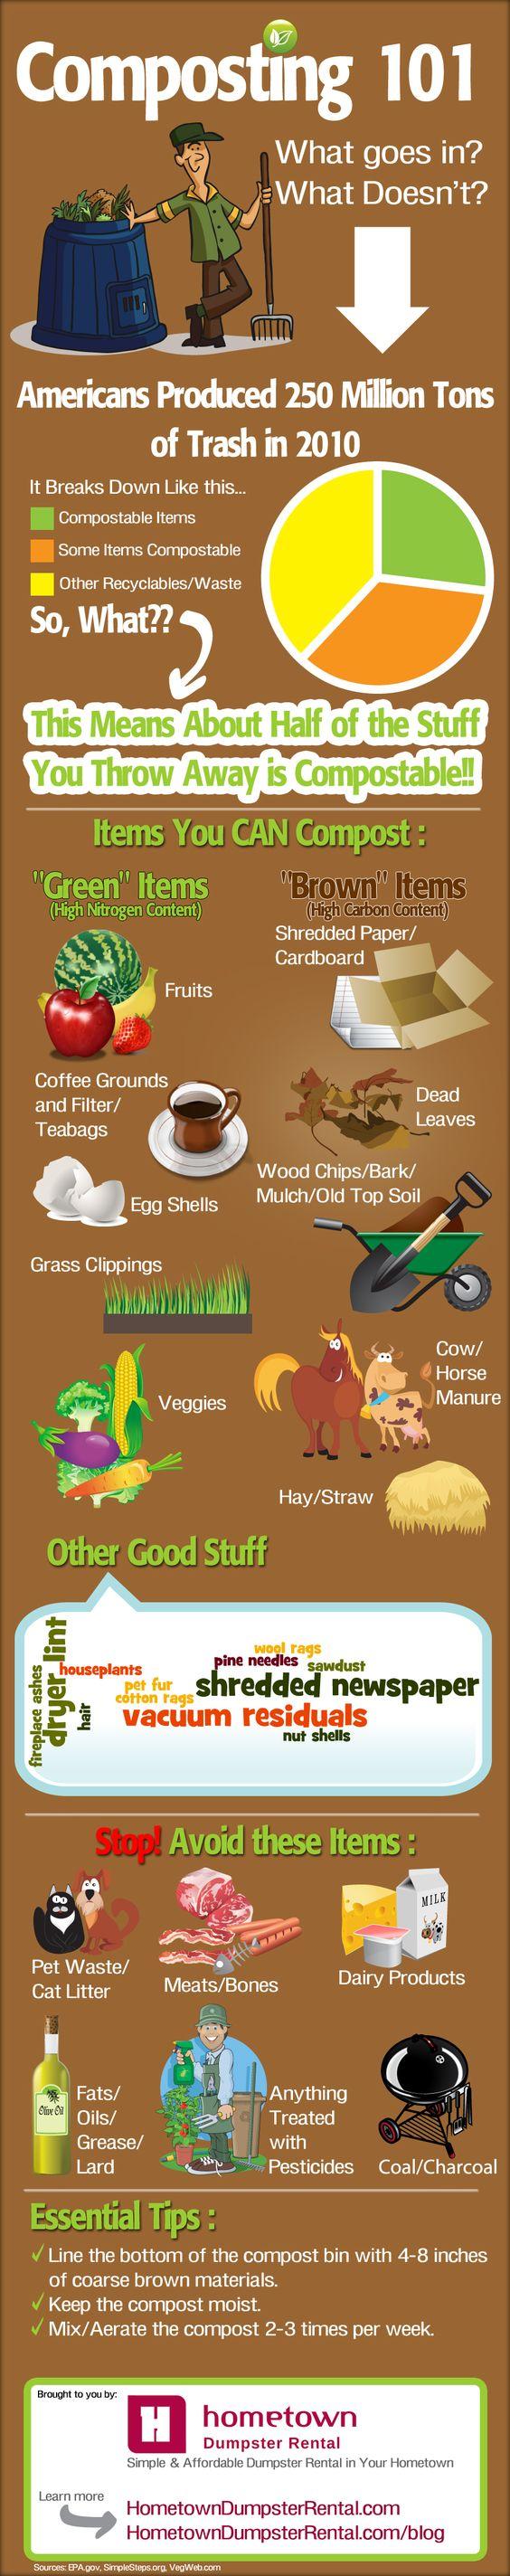 Gardening Info-Graphic: Composting 101